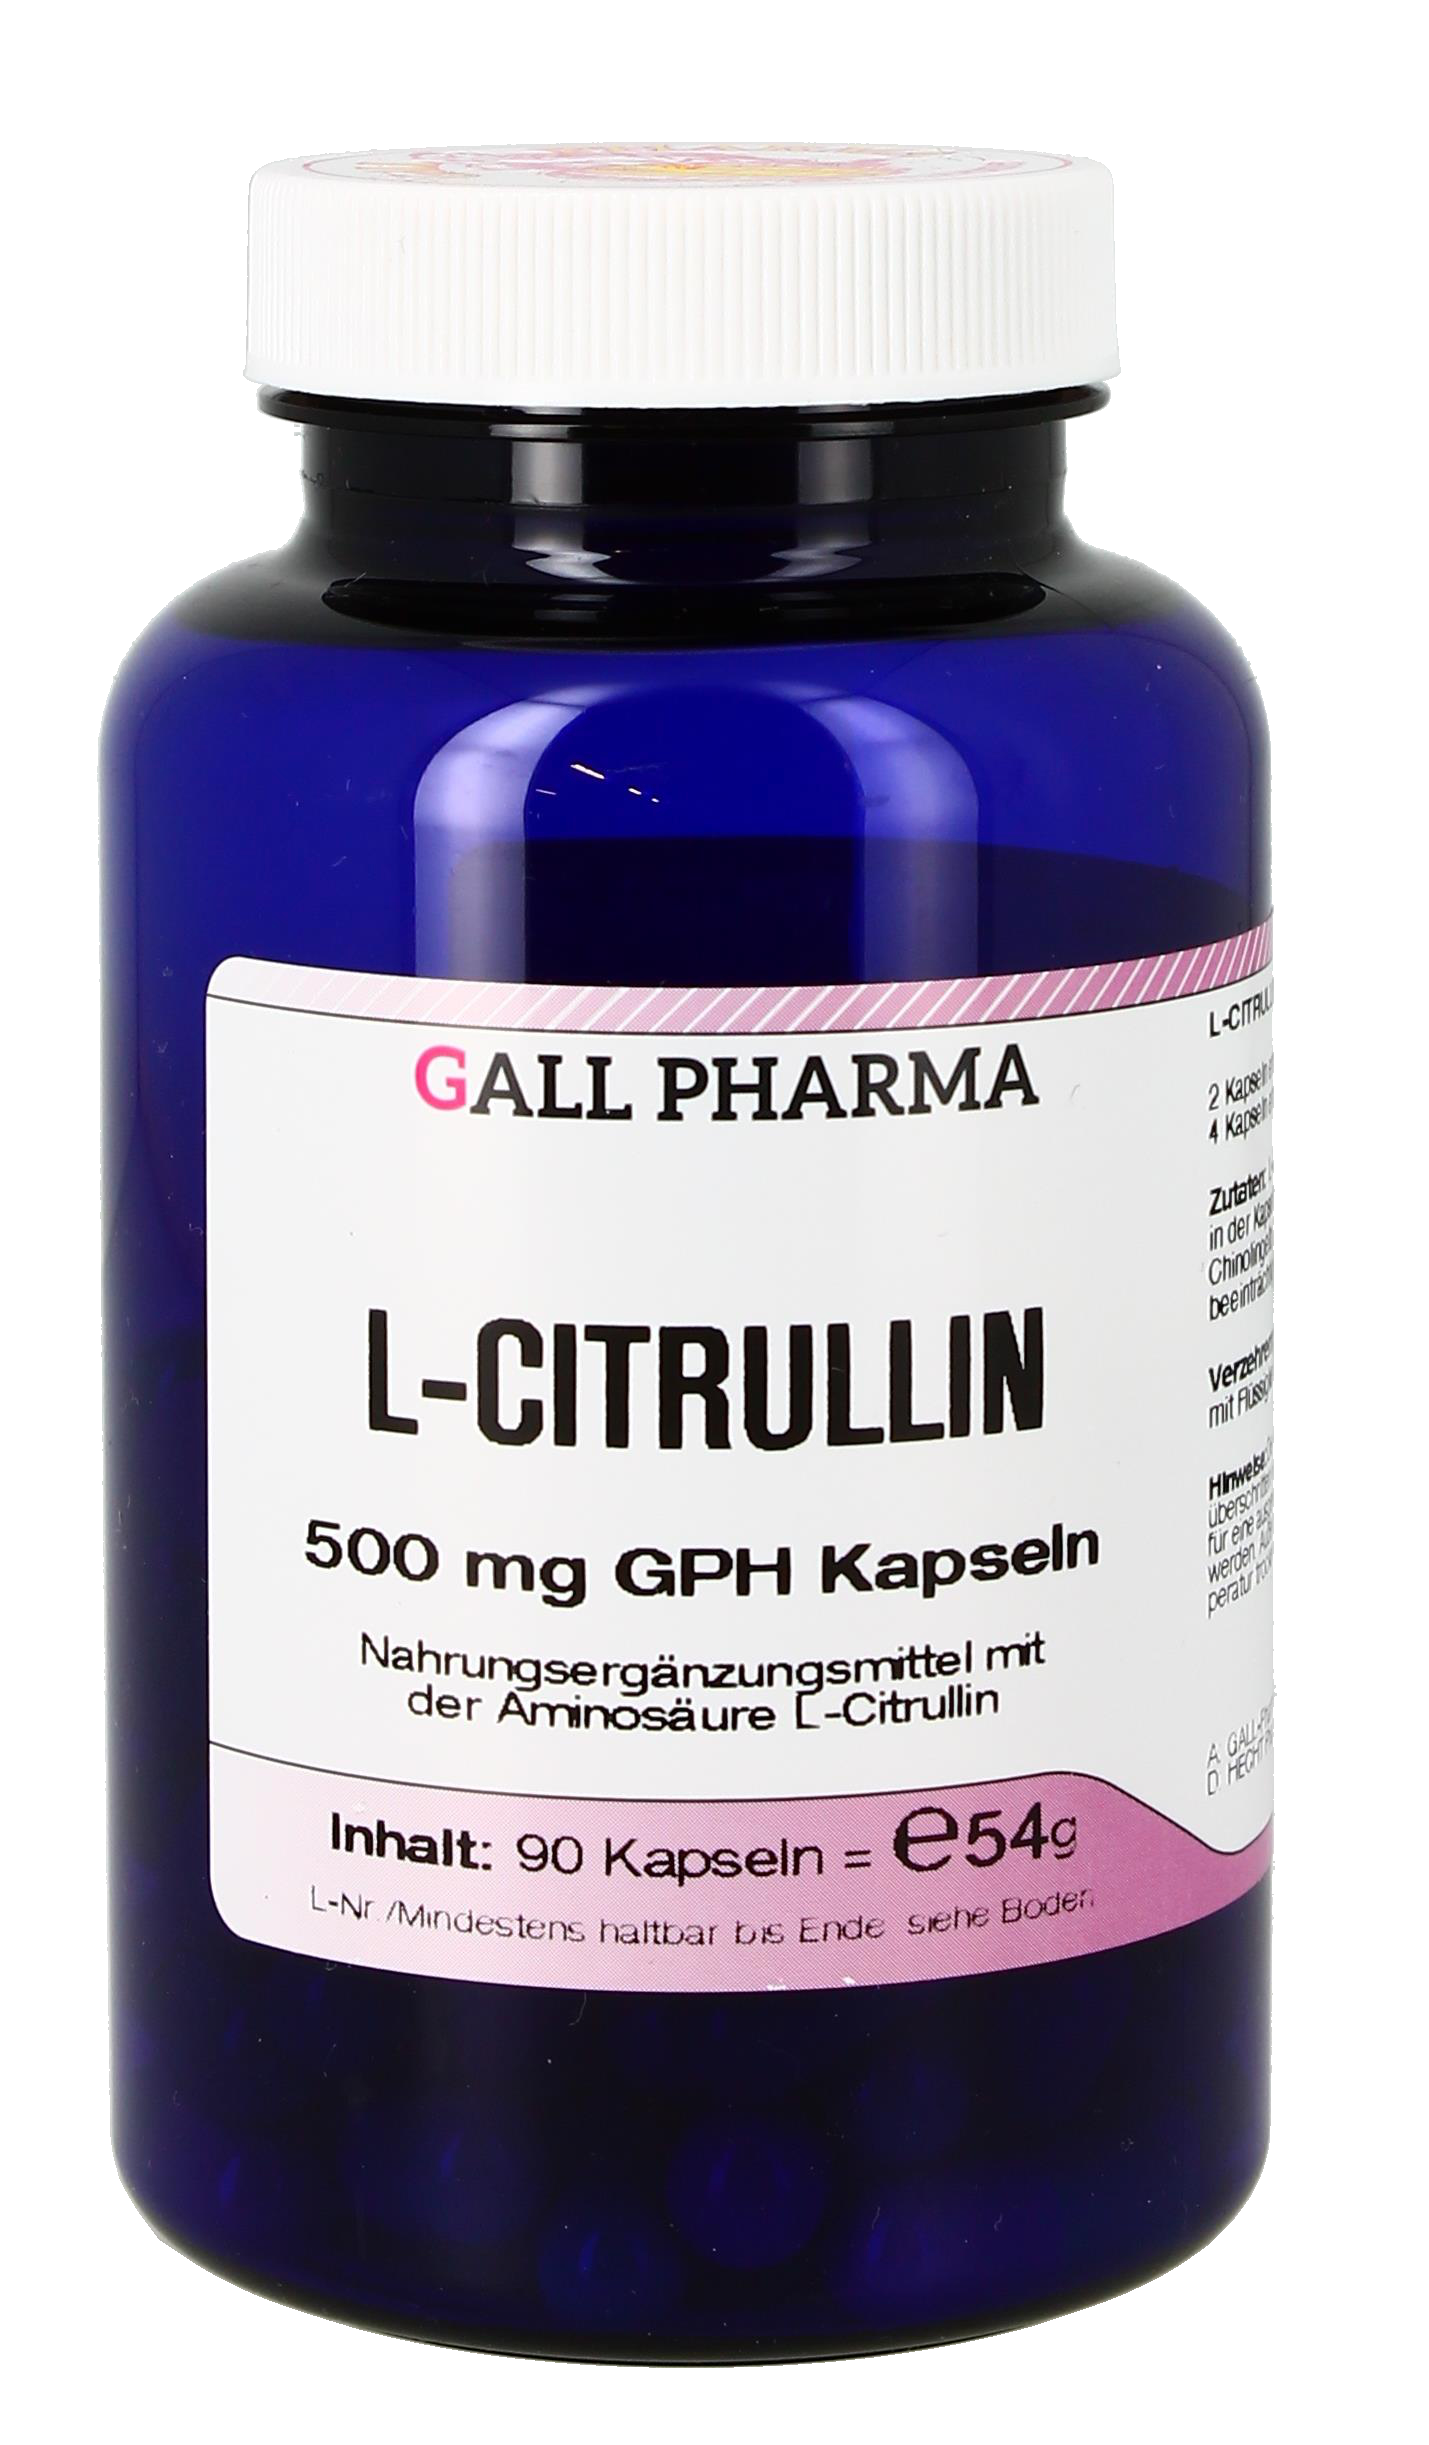 L-Citrullin 500 mg GPH Kapseln